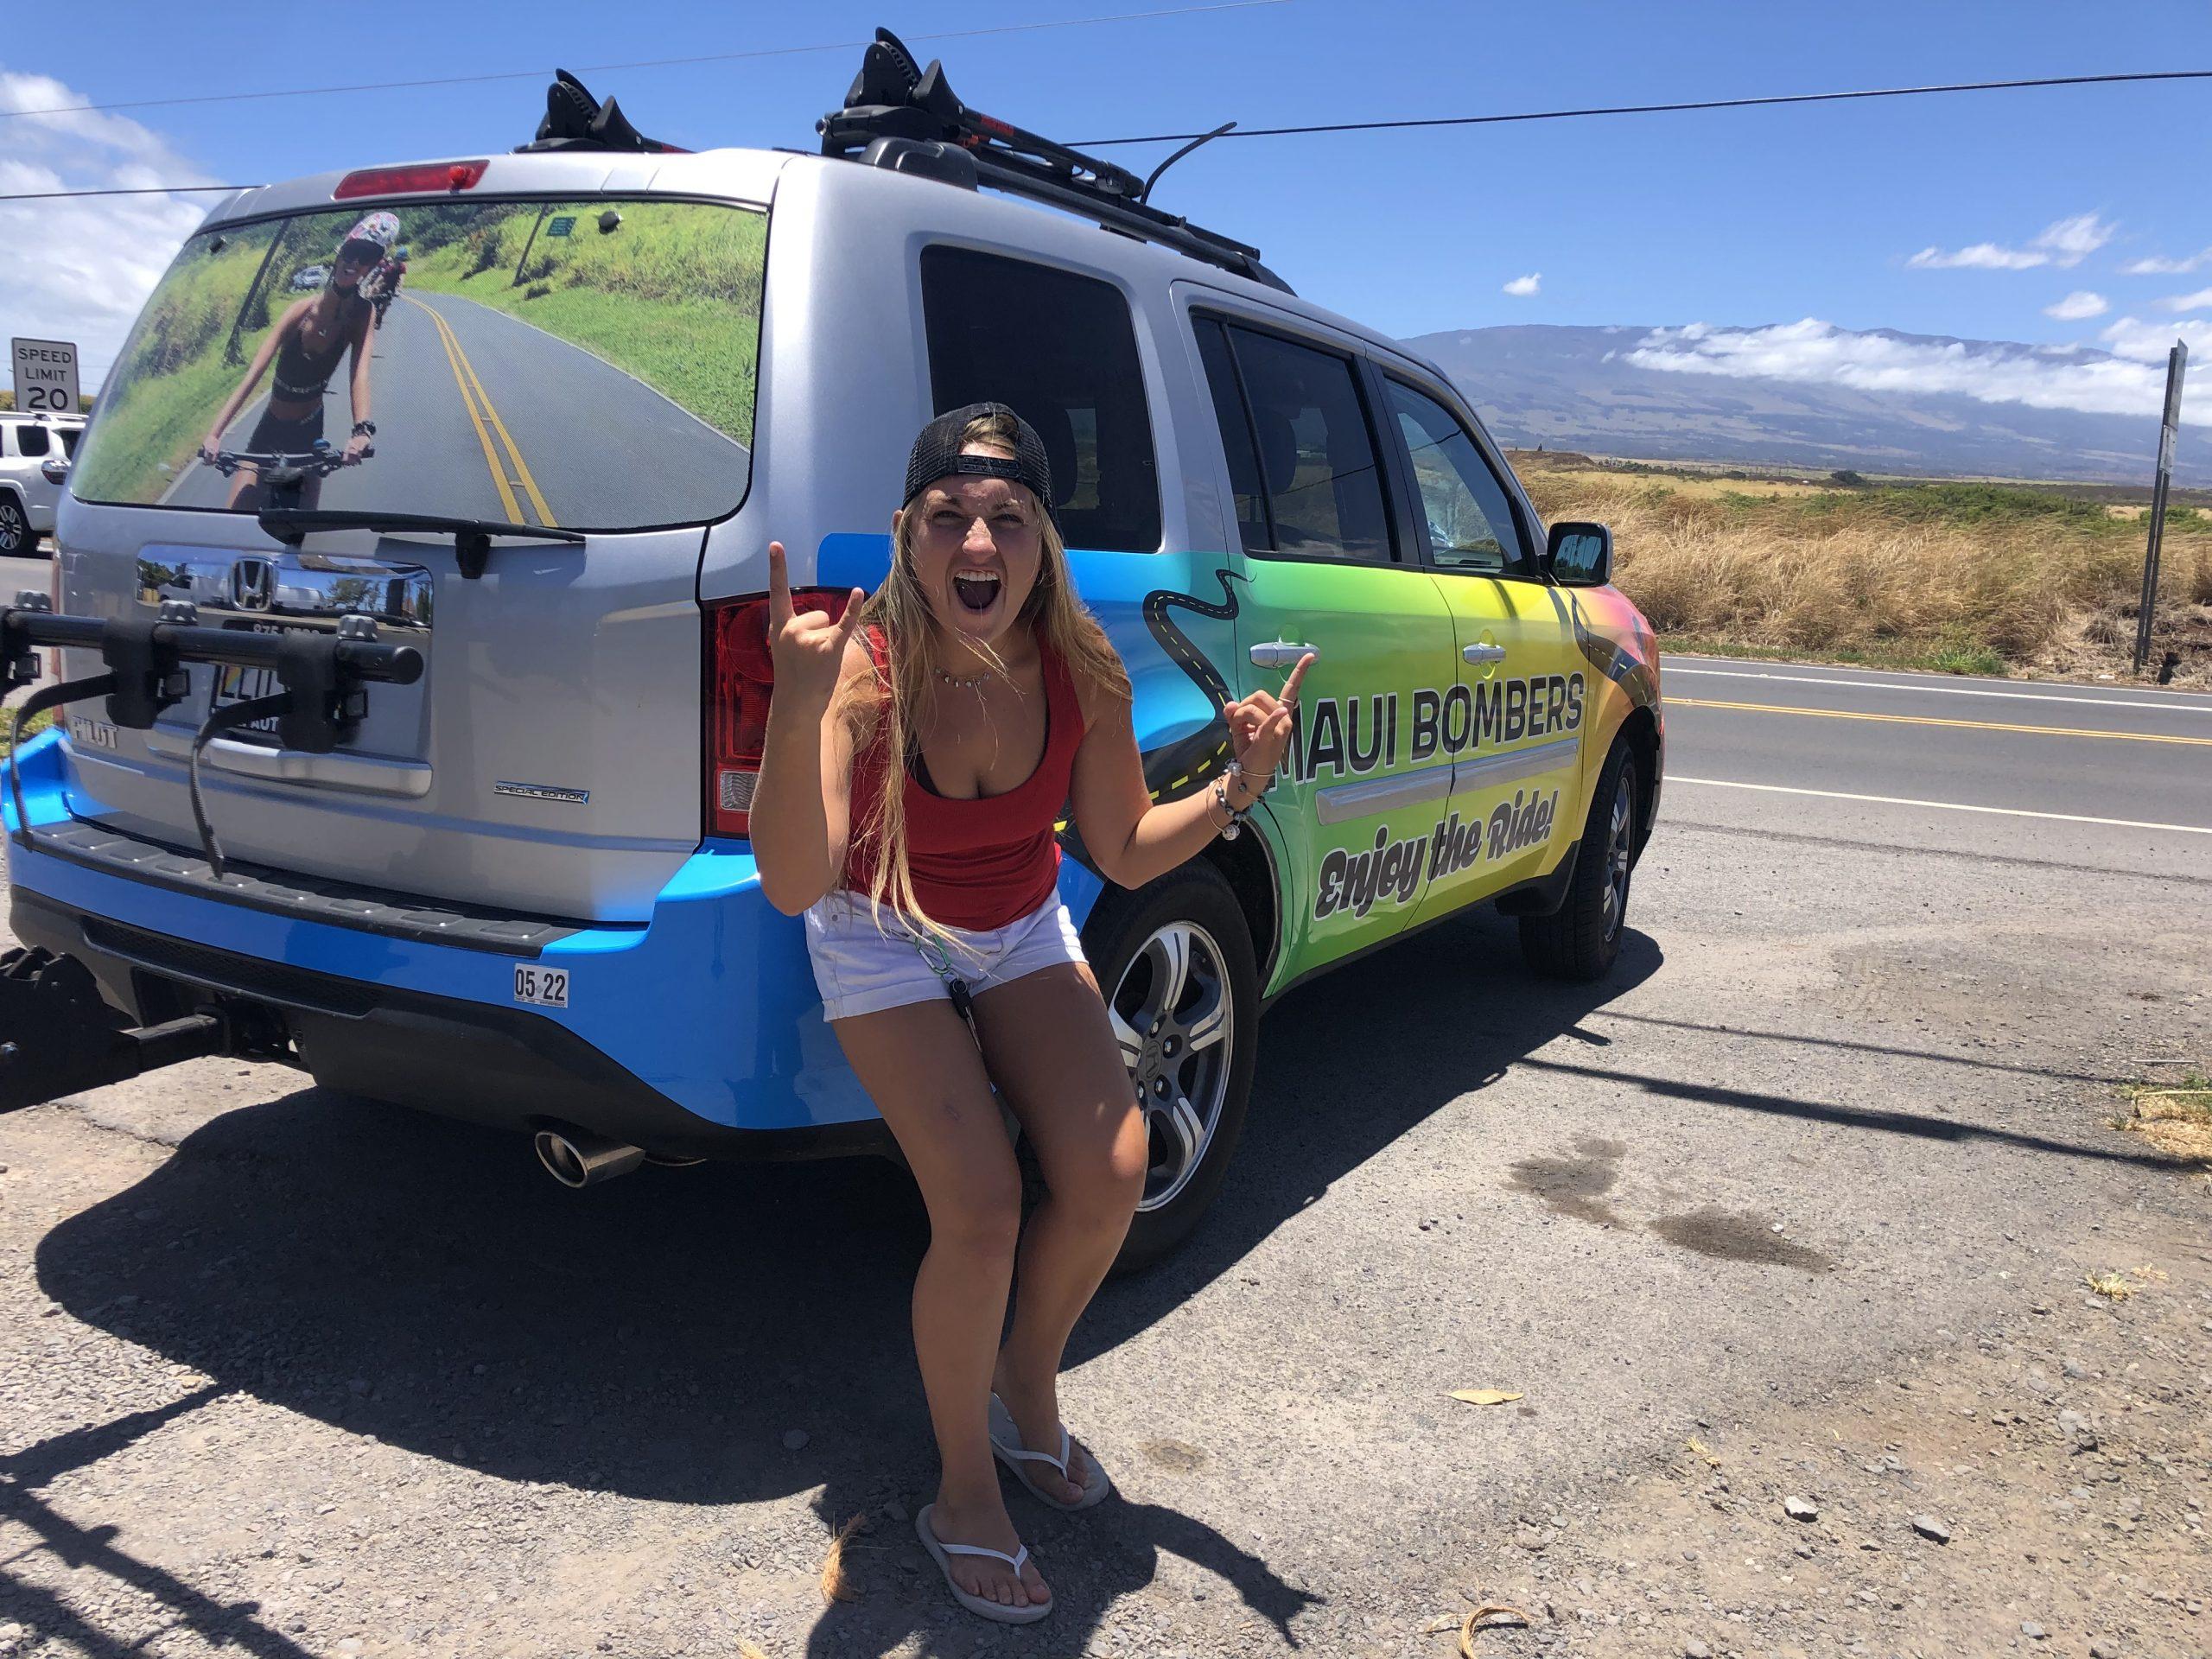 Maui Bombers Cycle to the Sea Tour rated #2 bike tour worldwide!